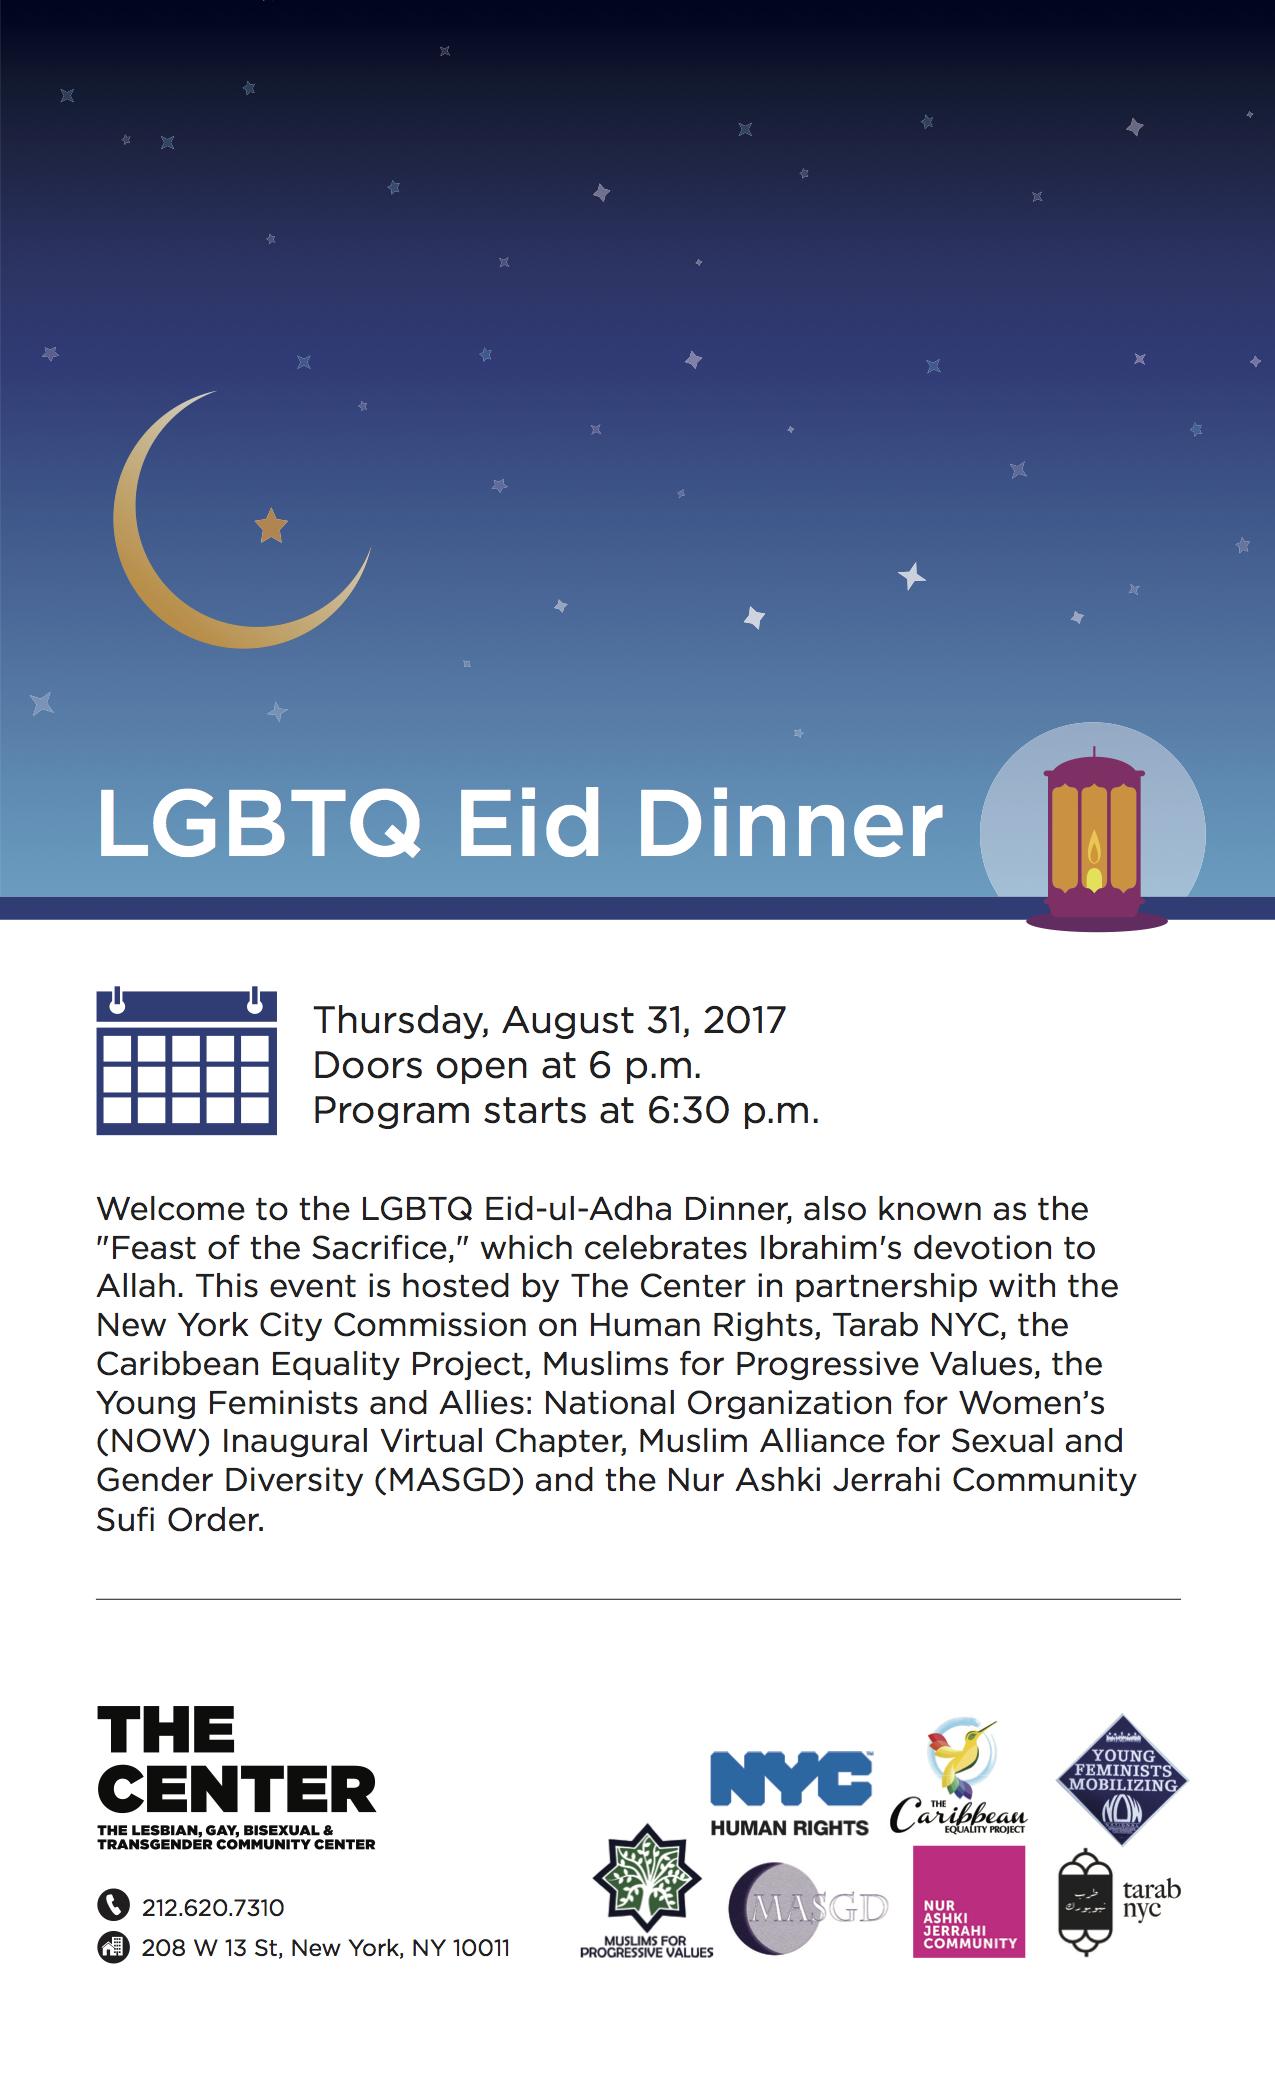 Organizer: LGBTQAI+ Muslims & Allies Eid-Ul-Adha Dinner